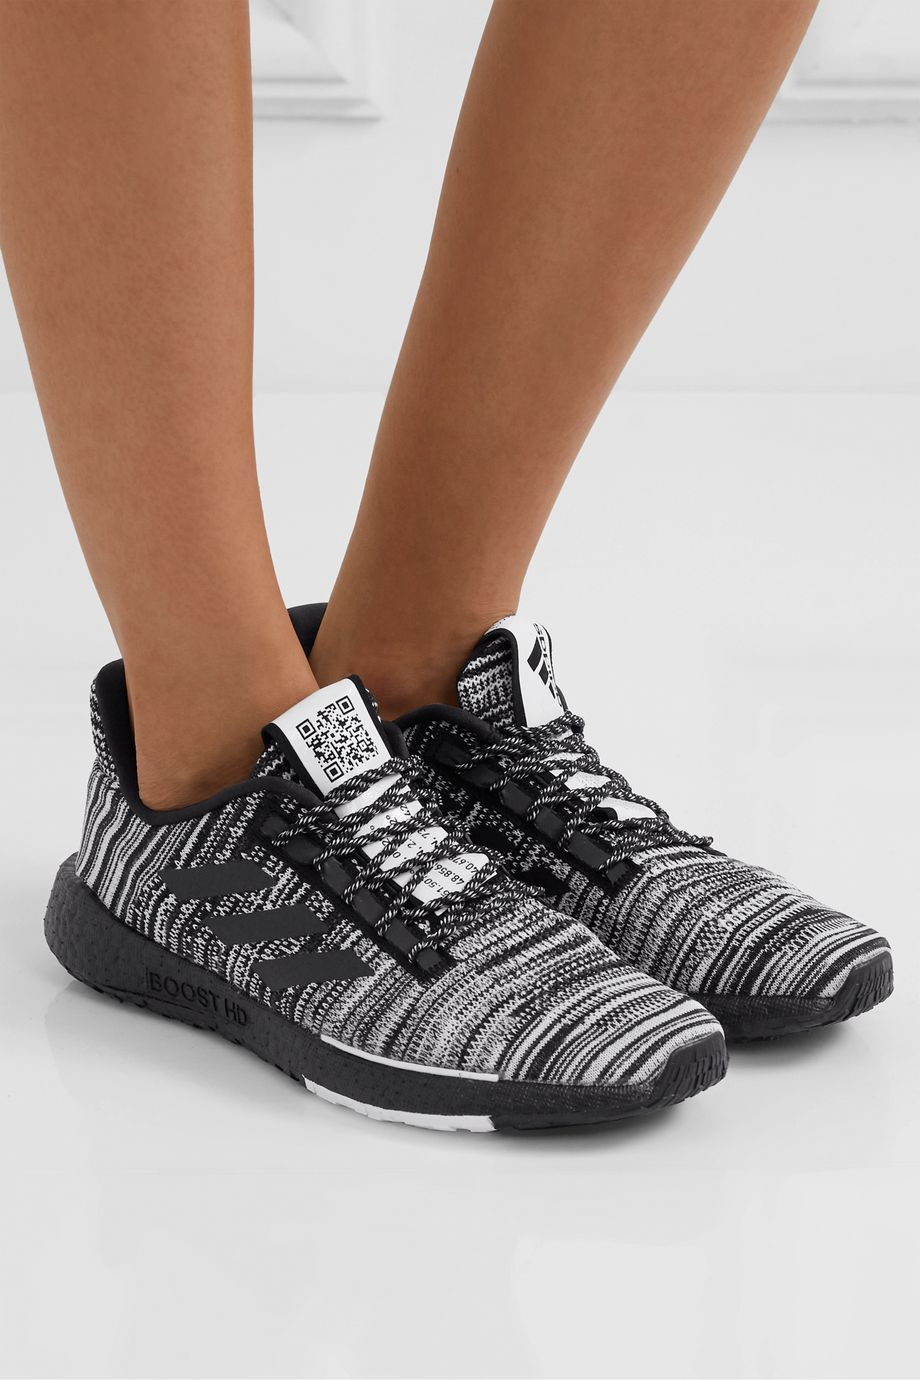 adidas Originals + Missoni Pulseboost crochet-knit sneakers